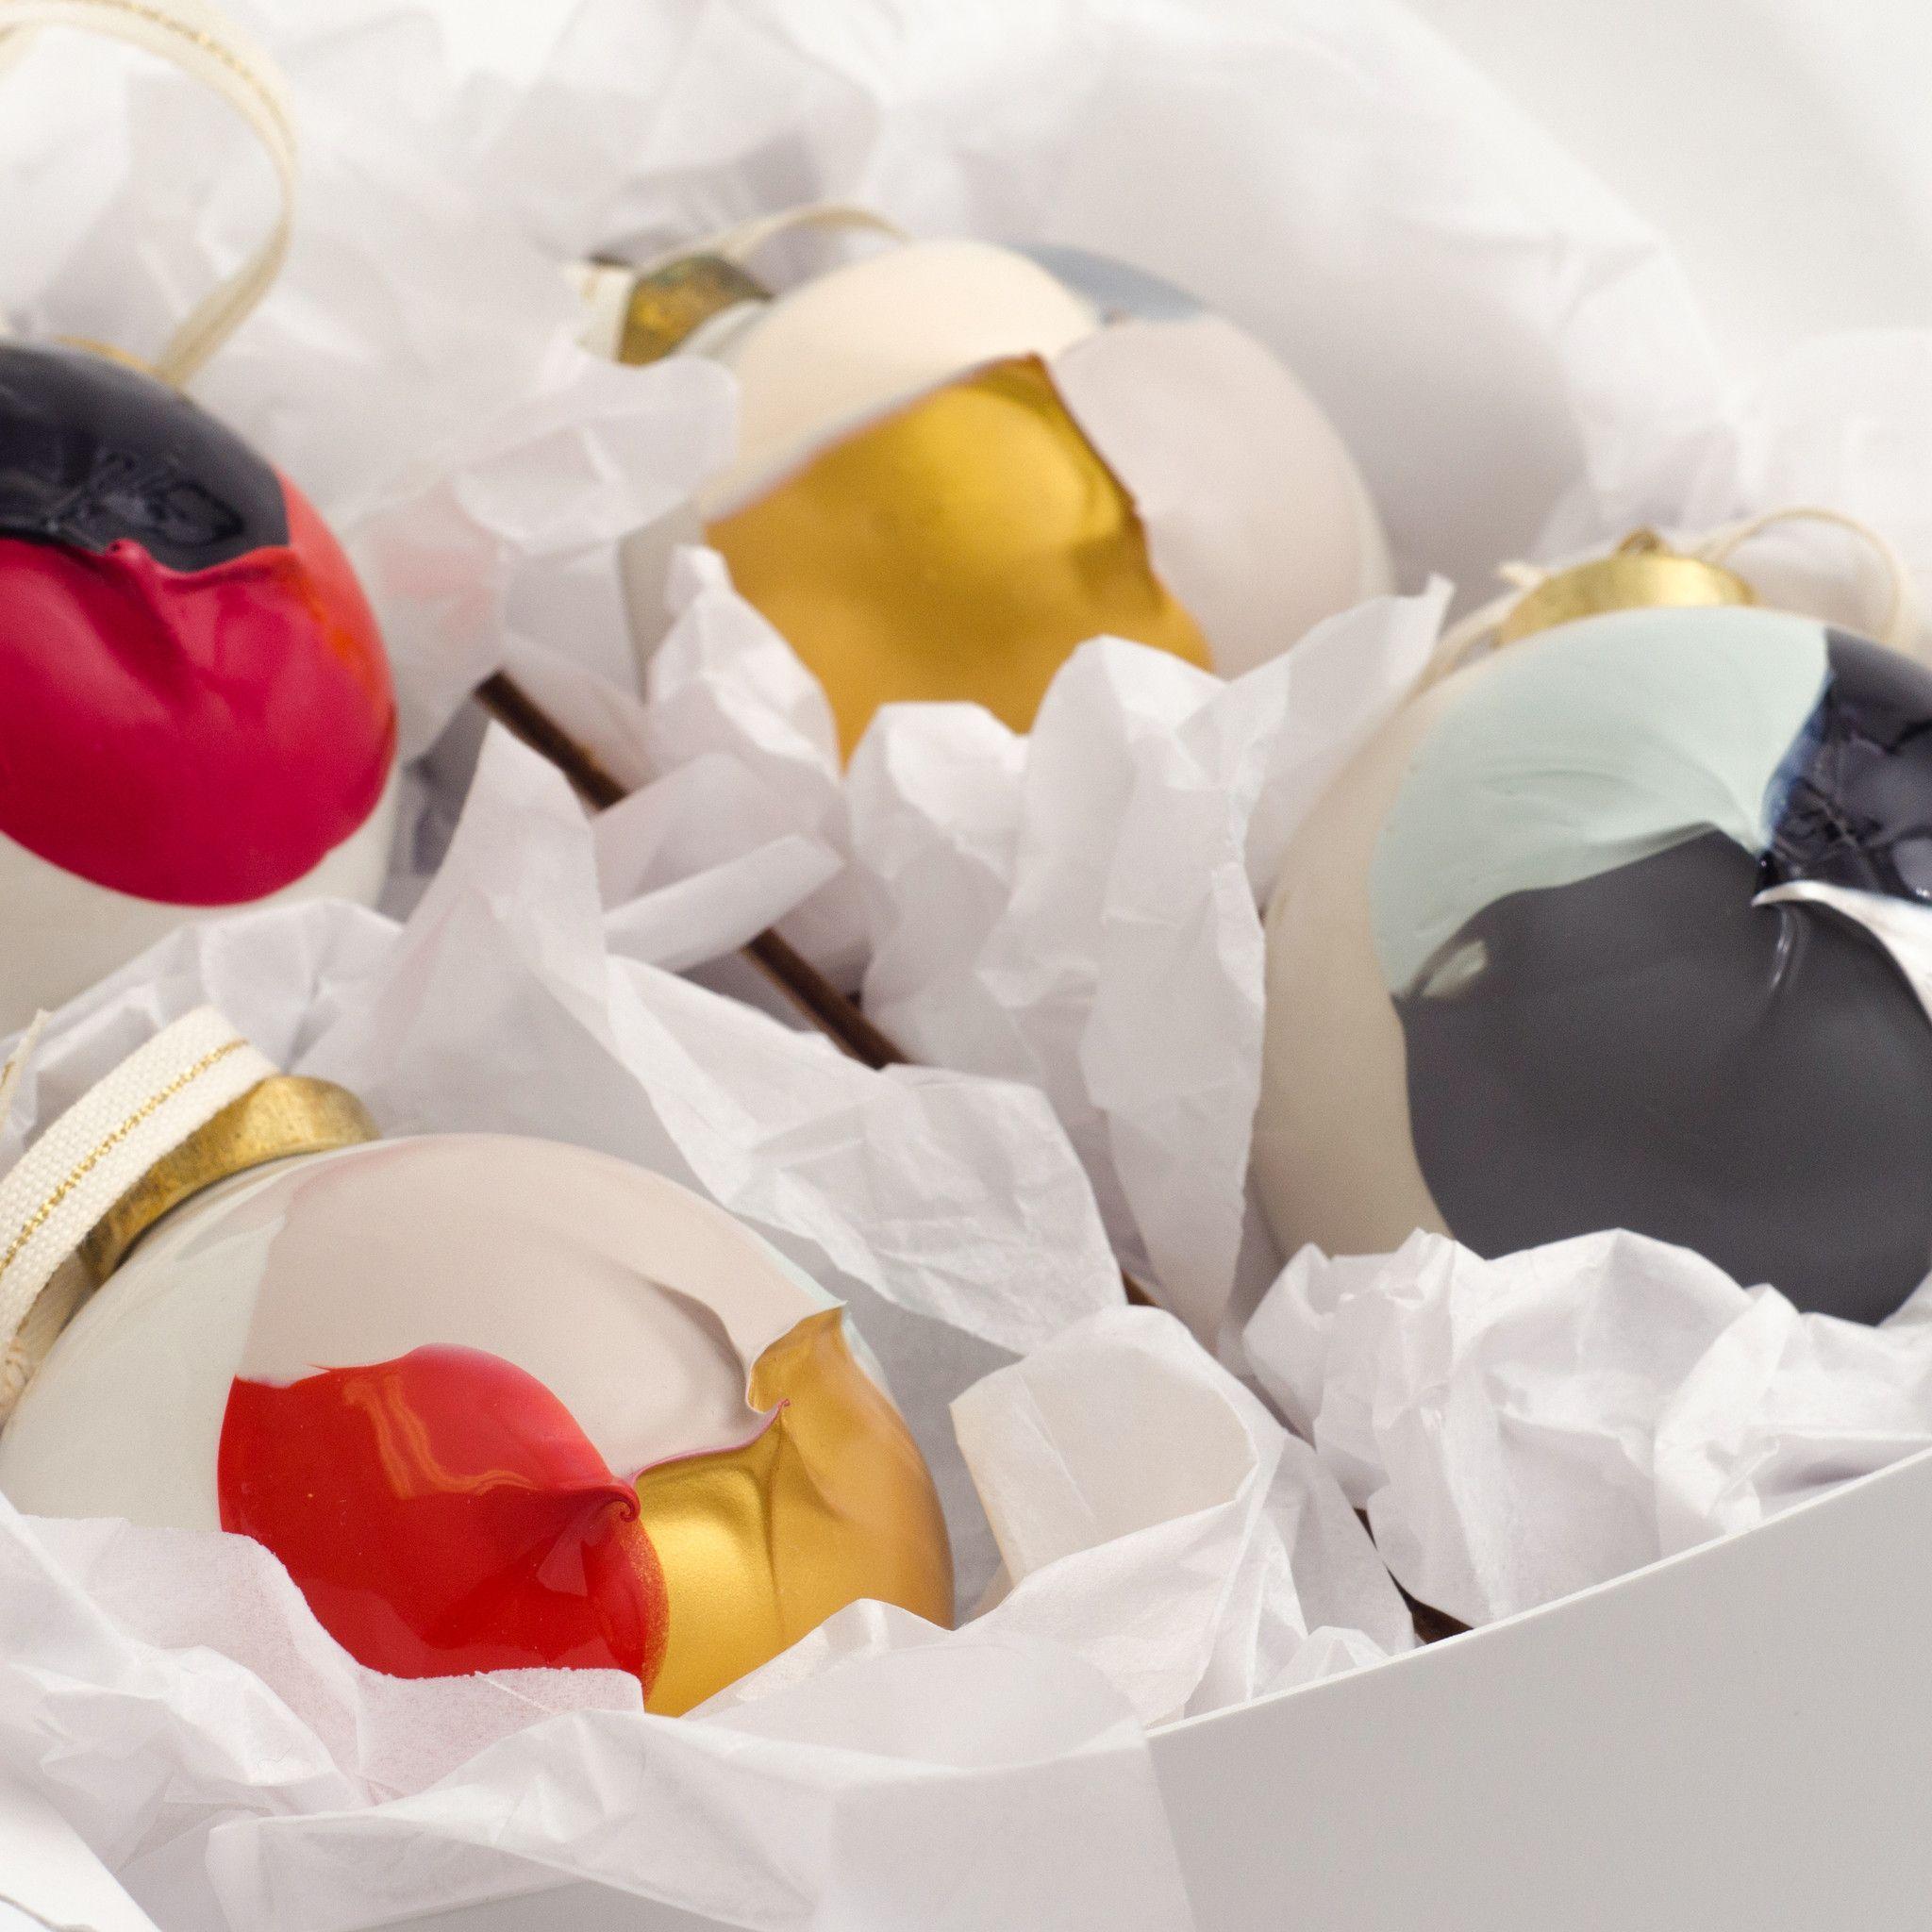 Hand-Painted Porcelain Ornaments